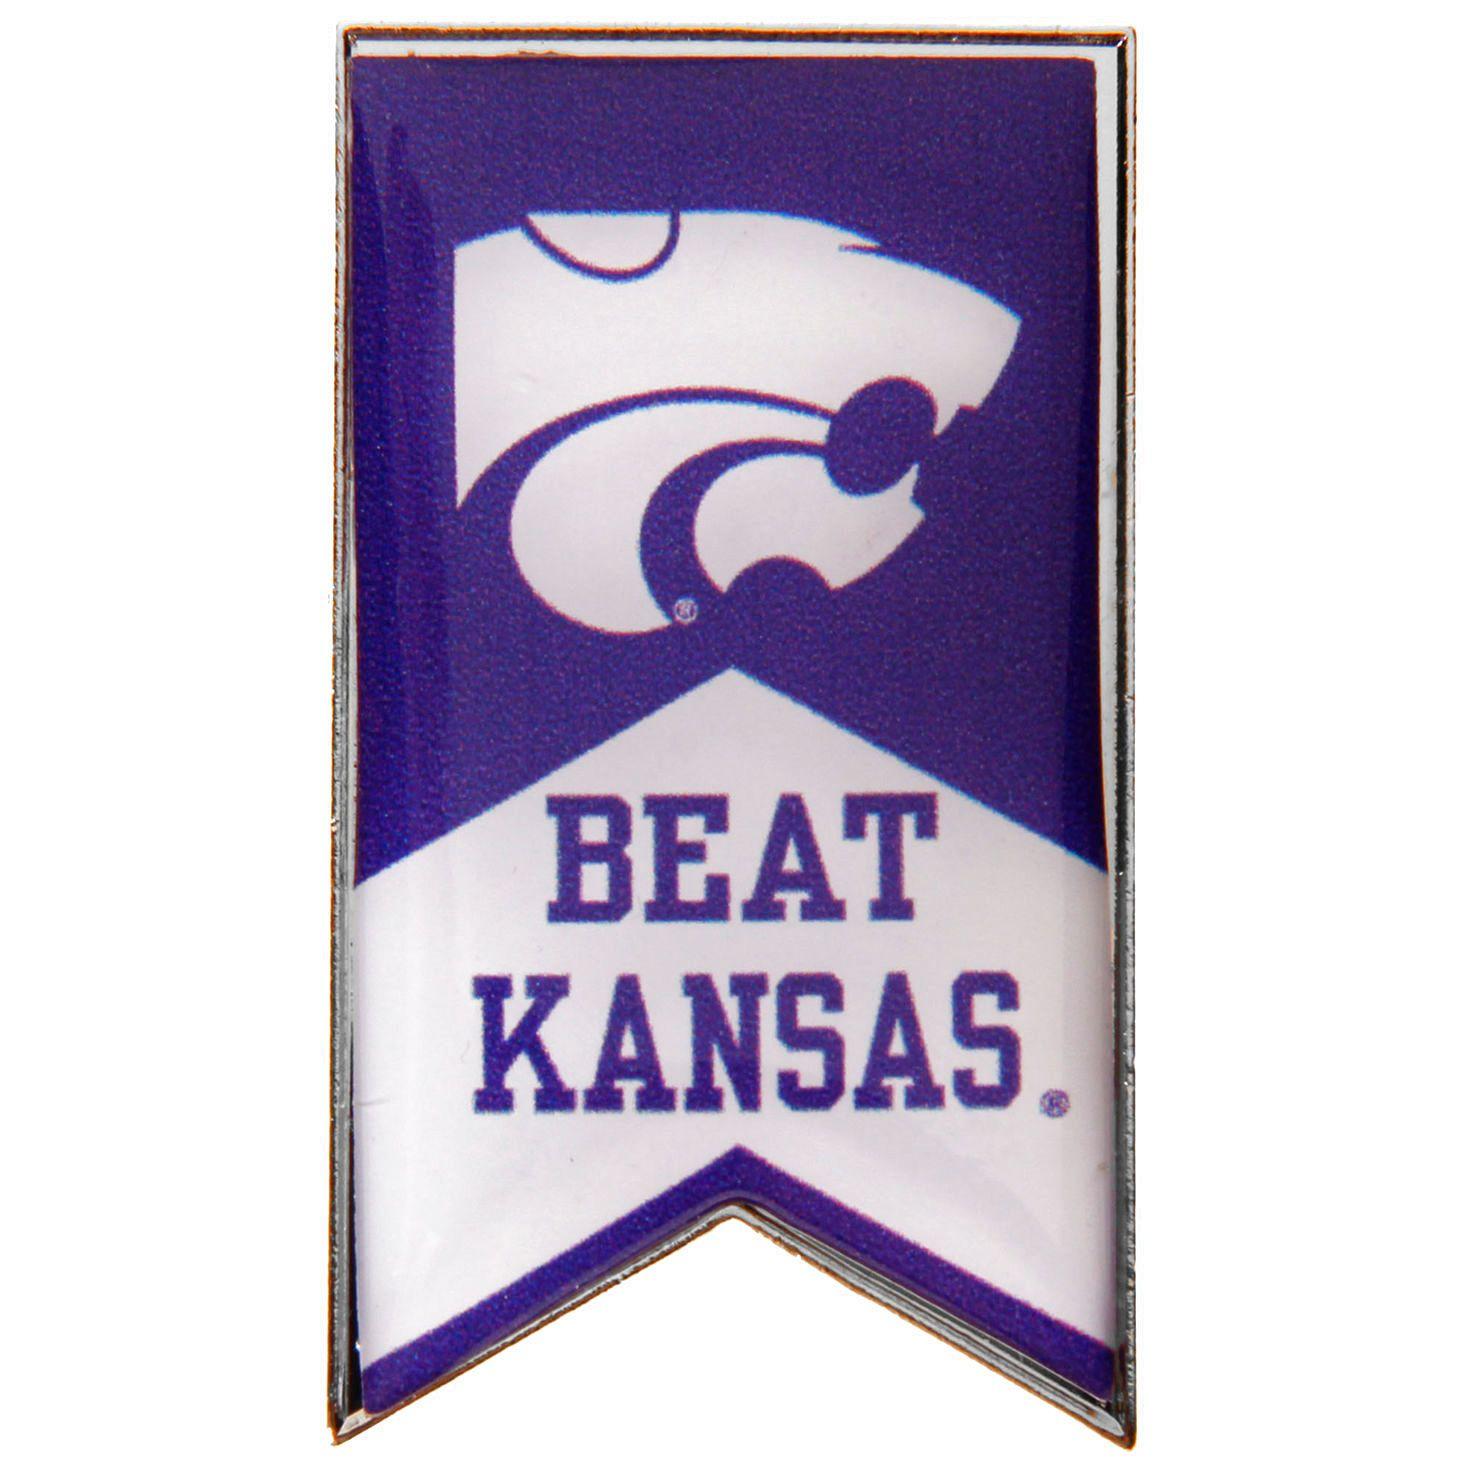 Kansas State Wildcats Beat Kansas Rivalry Banner Pin - $5.59